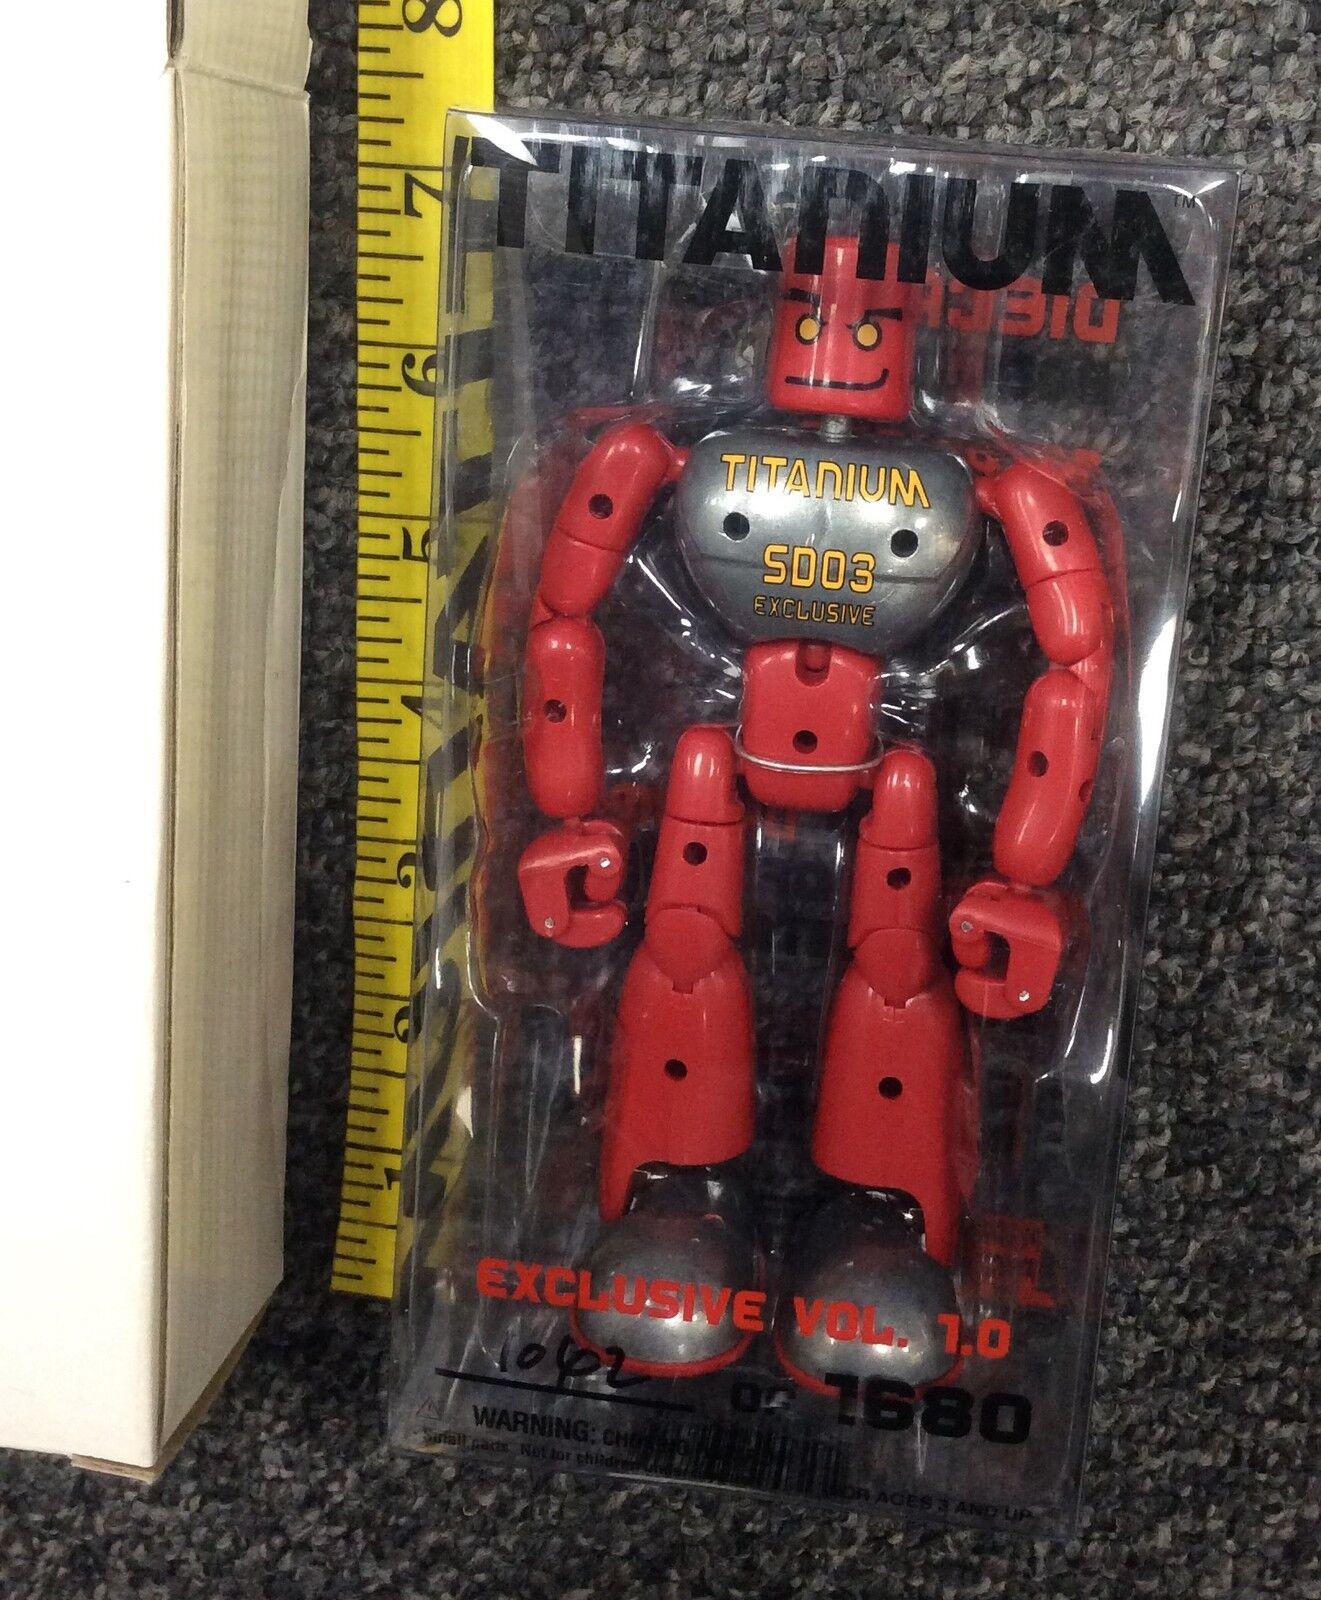 2003 Playmind Toys SDCC 2003 Exclusive Titanium Vol. 1.0  1062 of 1680 NIB VHTF